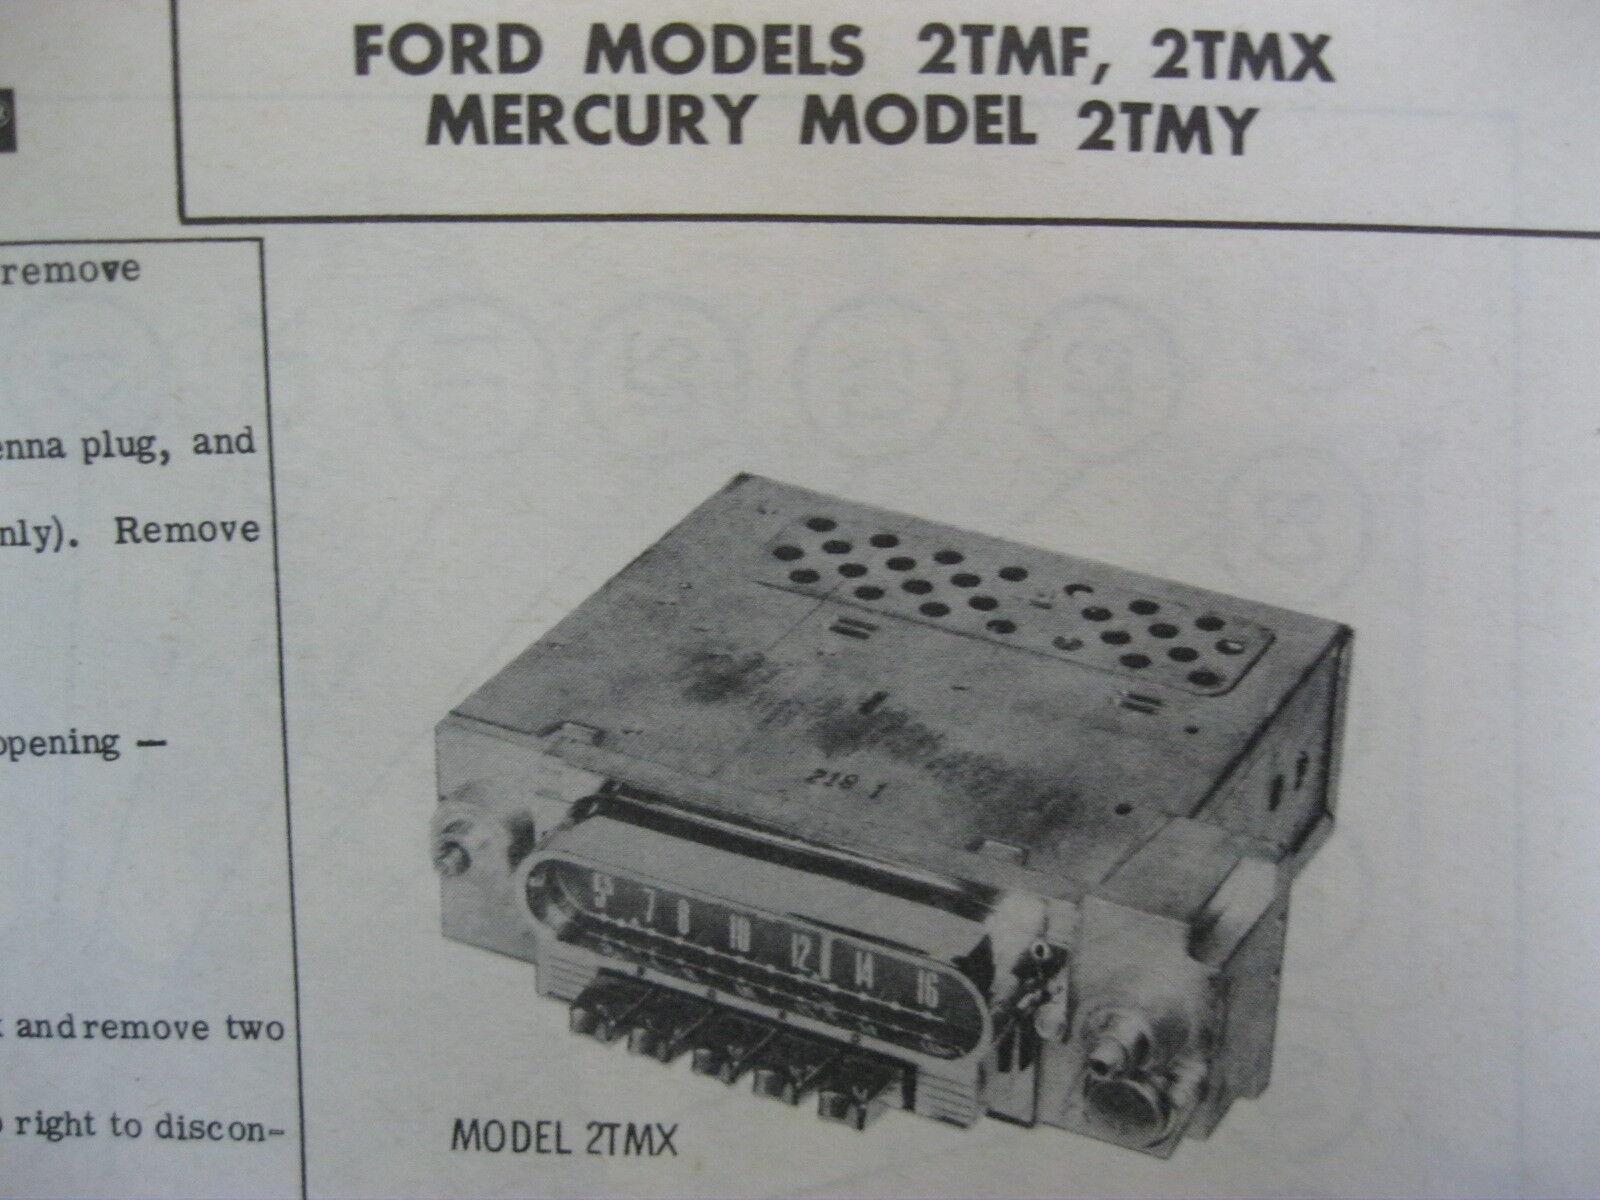 1962 FORD 2TMF, GALAXIE 2TMX, MERCURY METEOR 2TMY RADIO PHOTOFACT